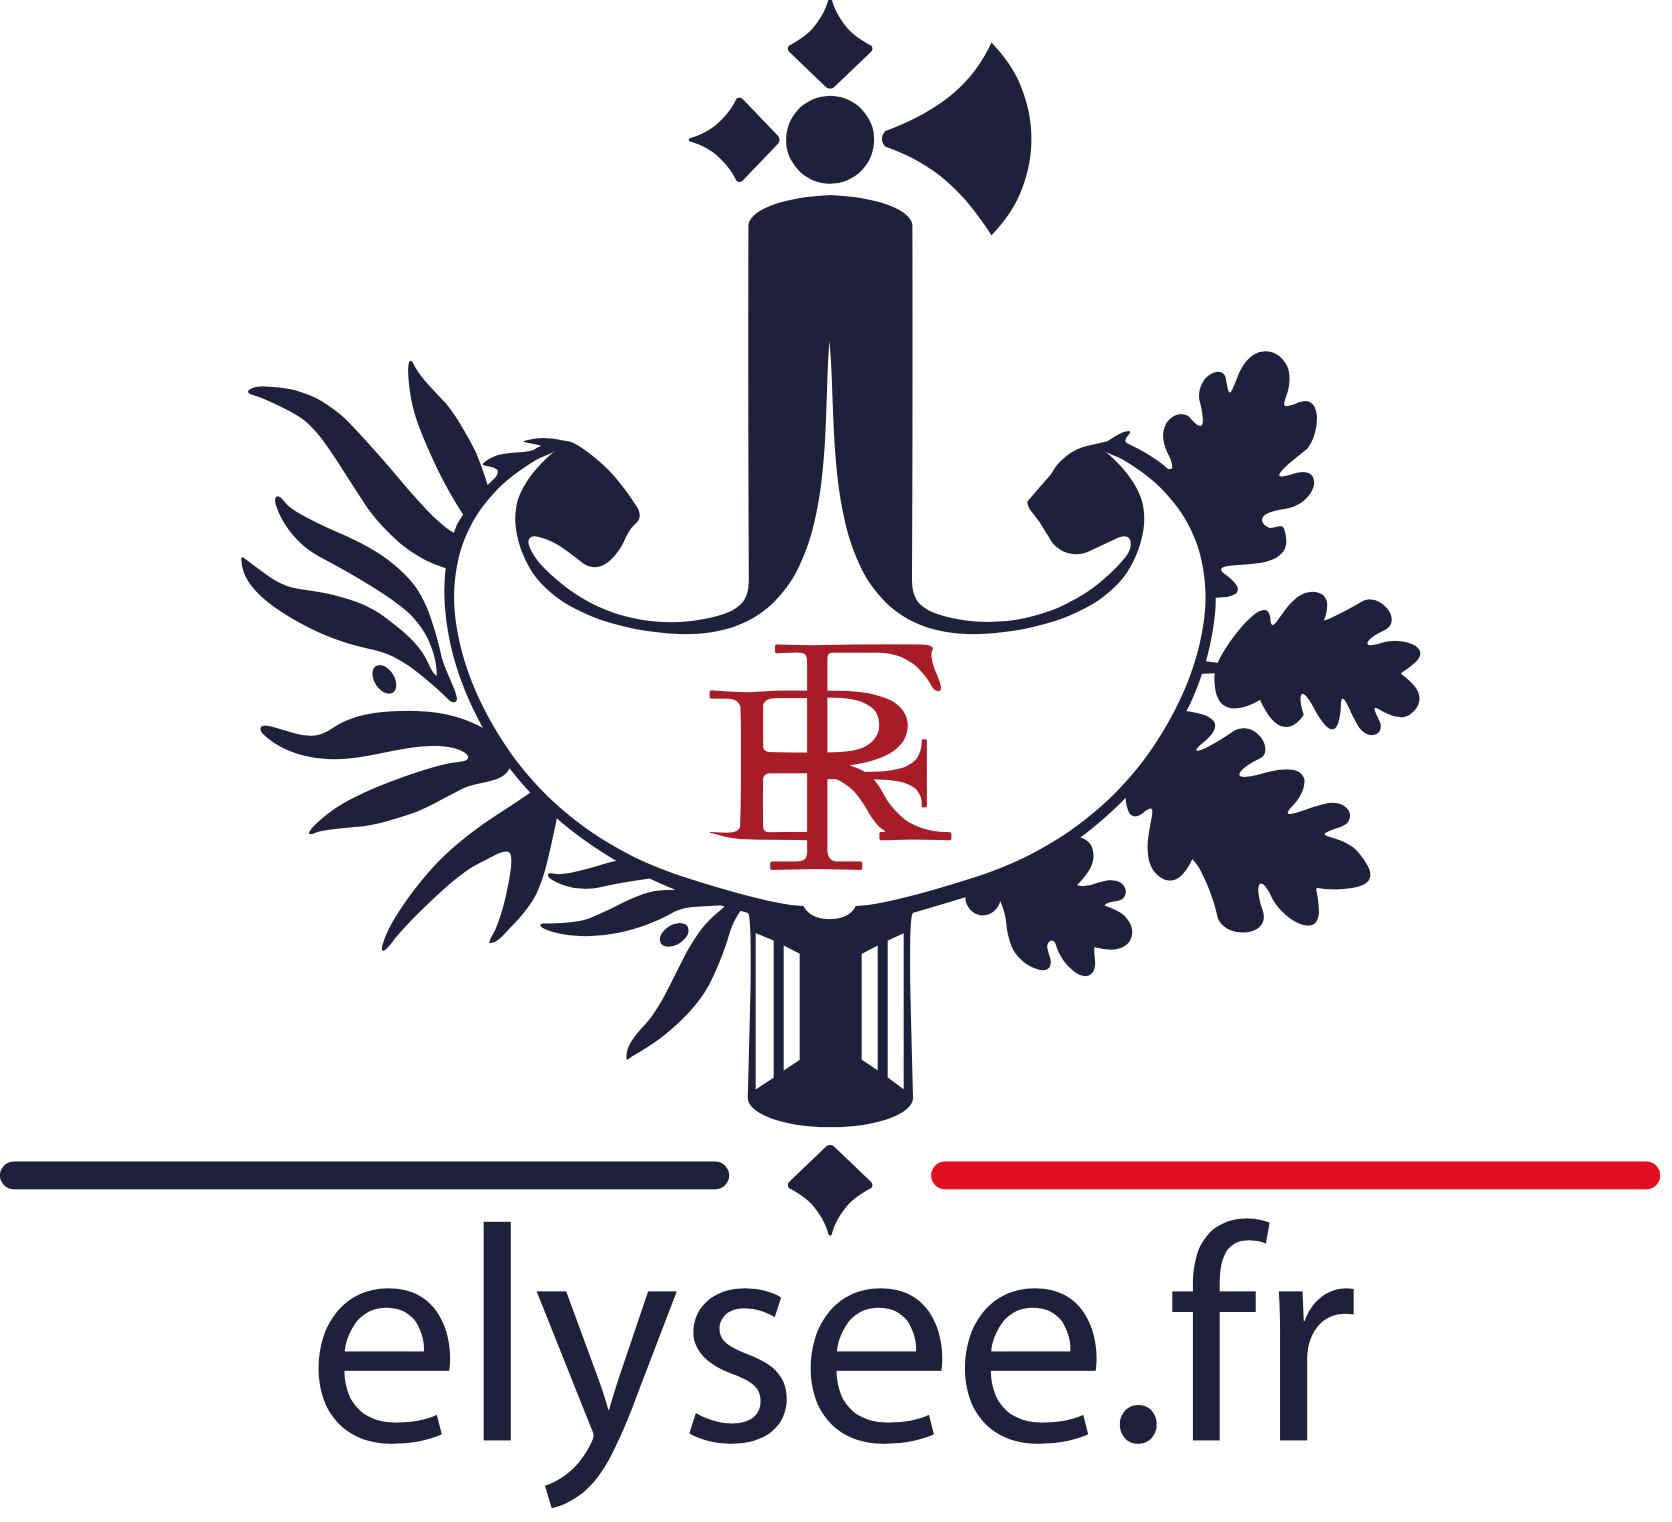 Elysee.fr logo